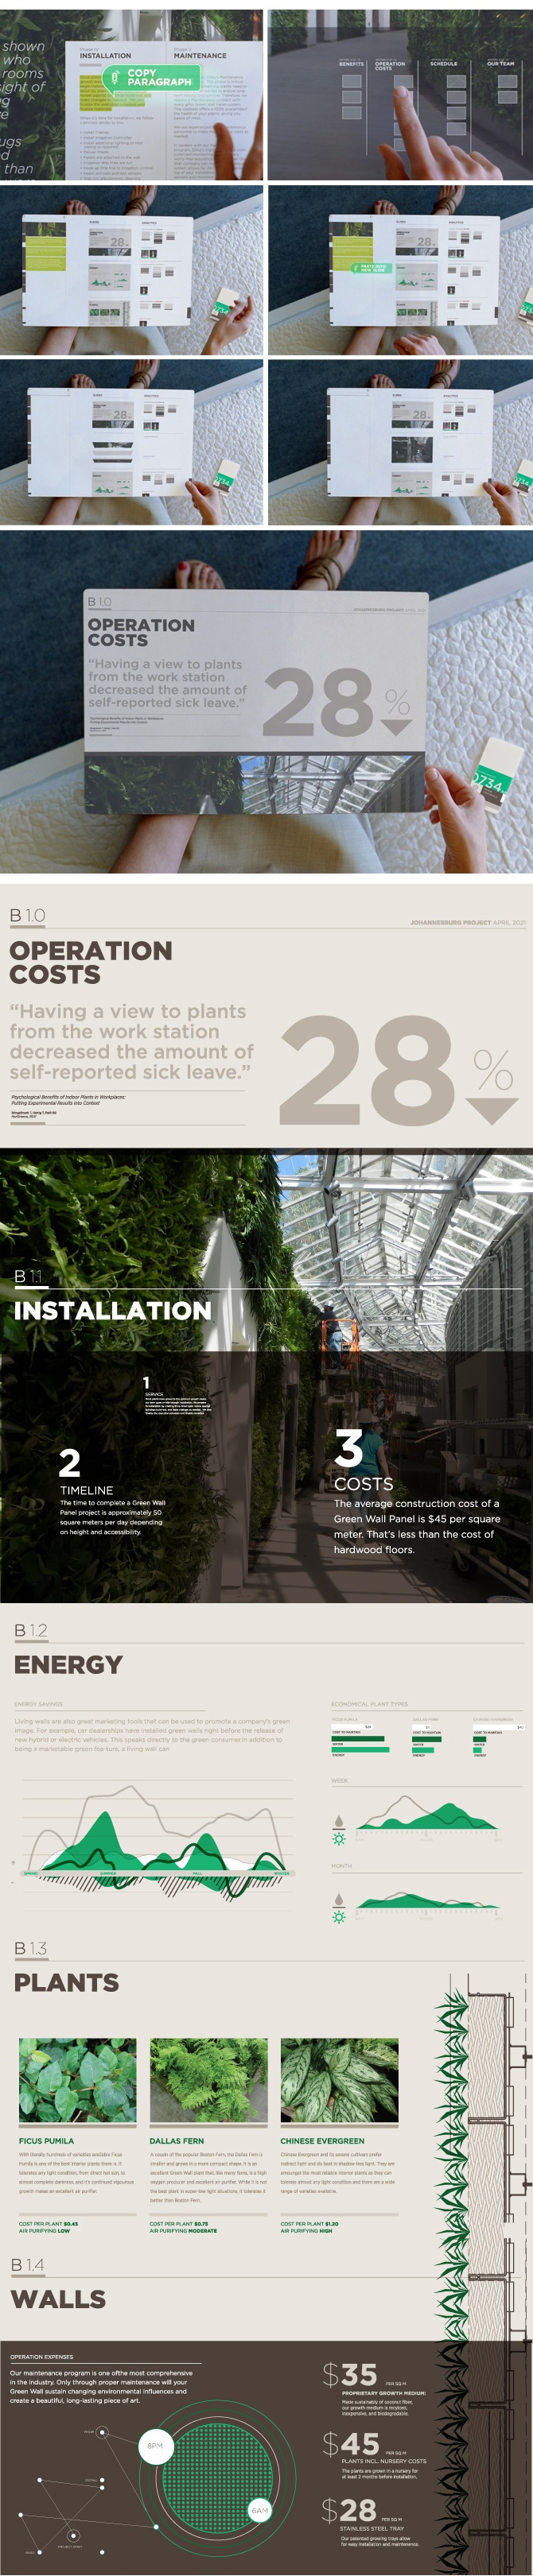 FUTURE VISION - Ethan Keller Branding & Visual Design